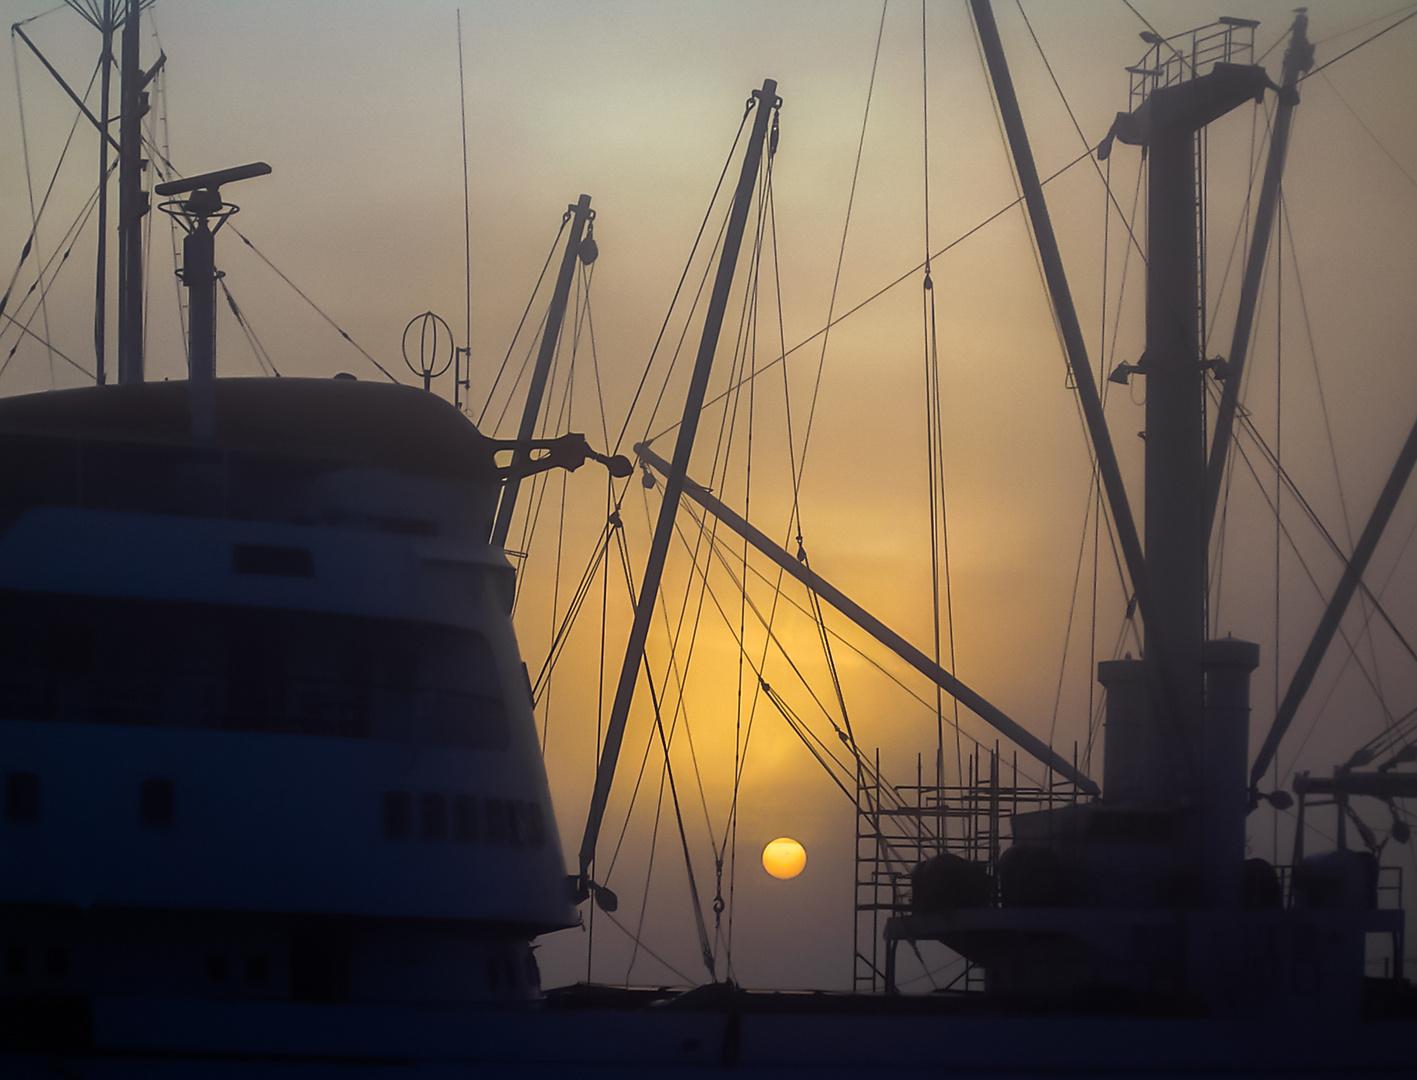 Museumsschiff Cap San Diego im Winternebel (Jan. 2005)